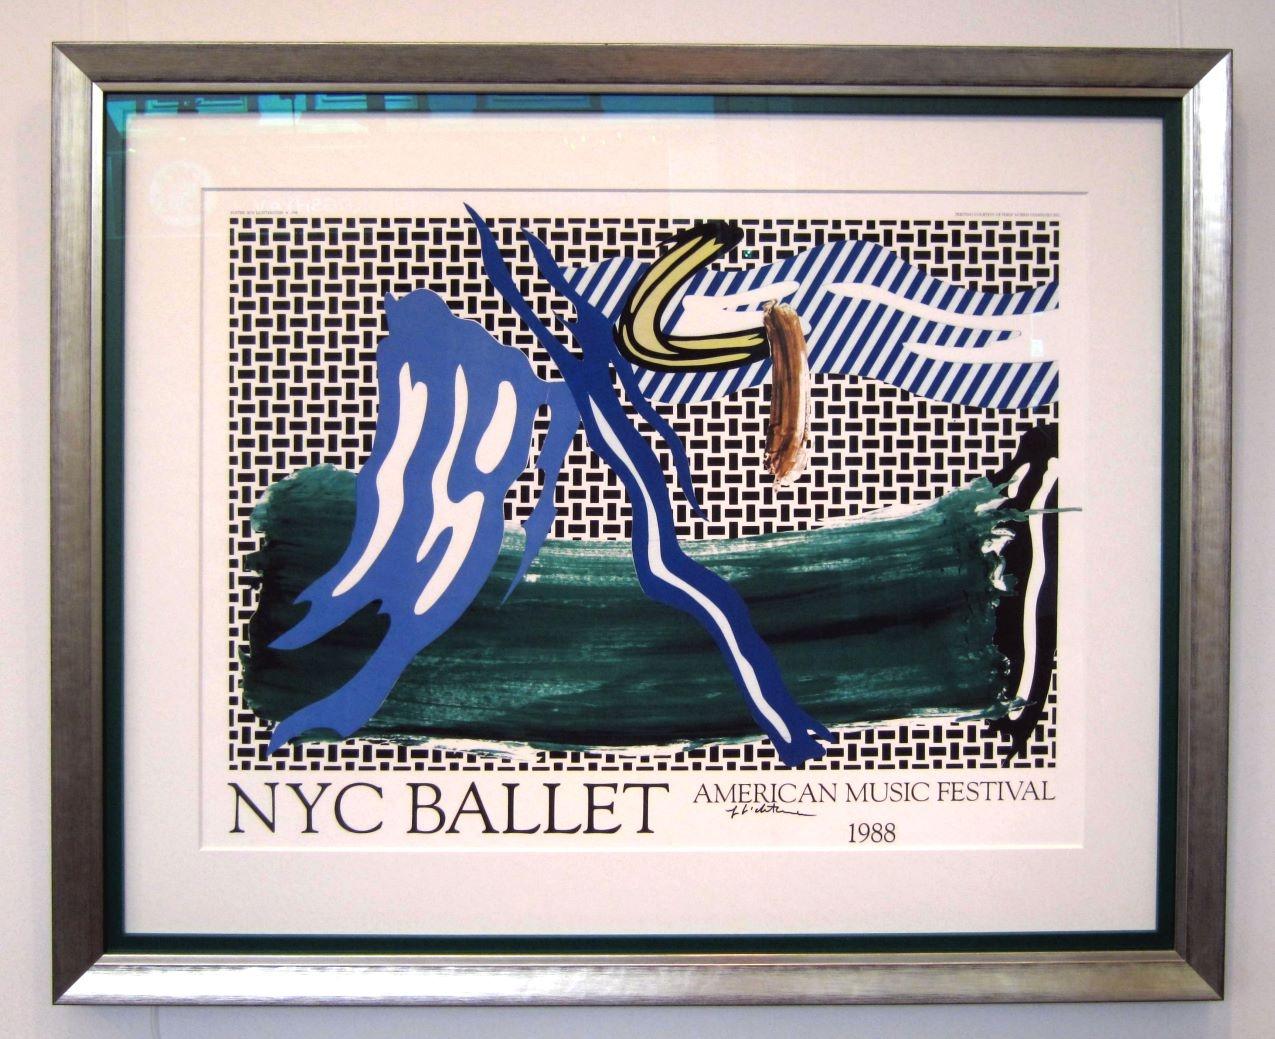 NYC Ballet, gerahmt